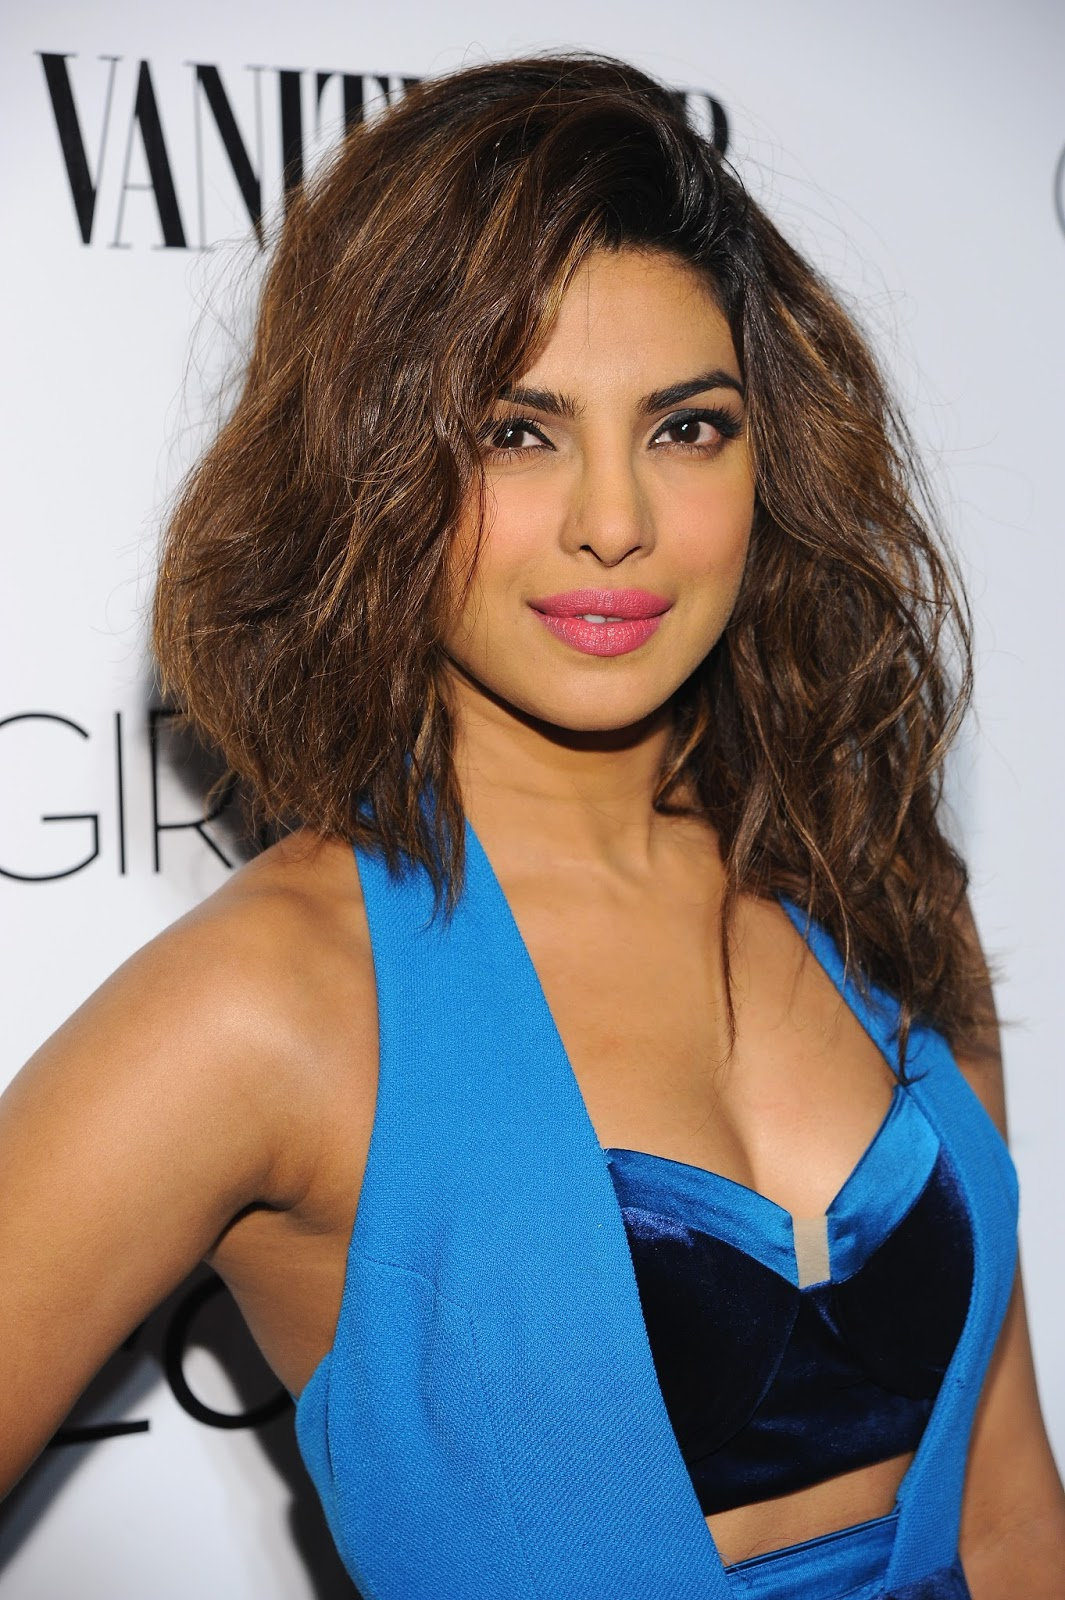 Priyanka Chopra Looks Smoking Hot At Vanity Fair & L'Oreal ...